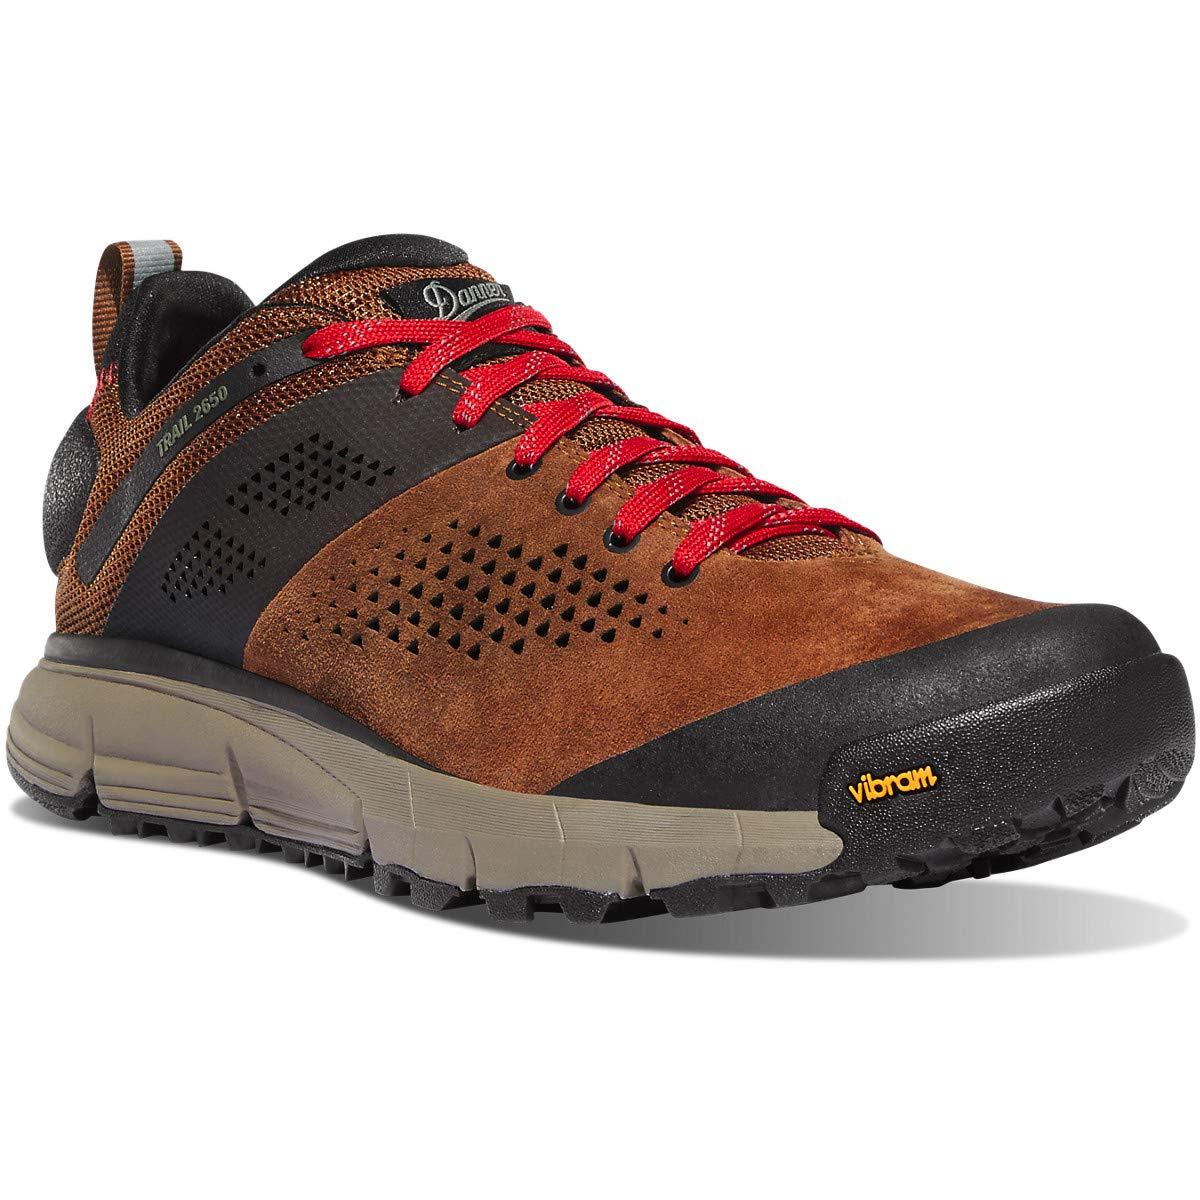 39b661bc13e Danner Men's Trail 2650 3